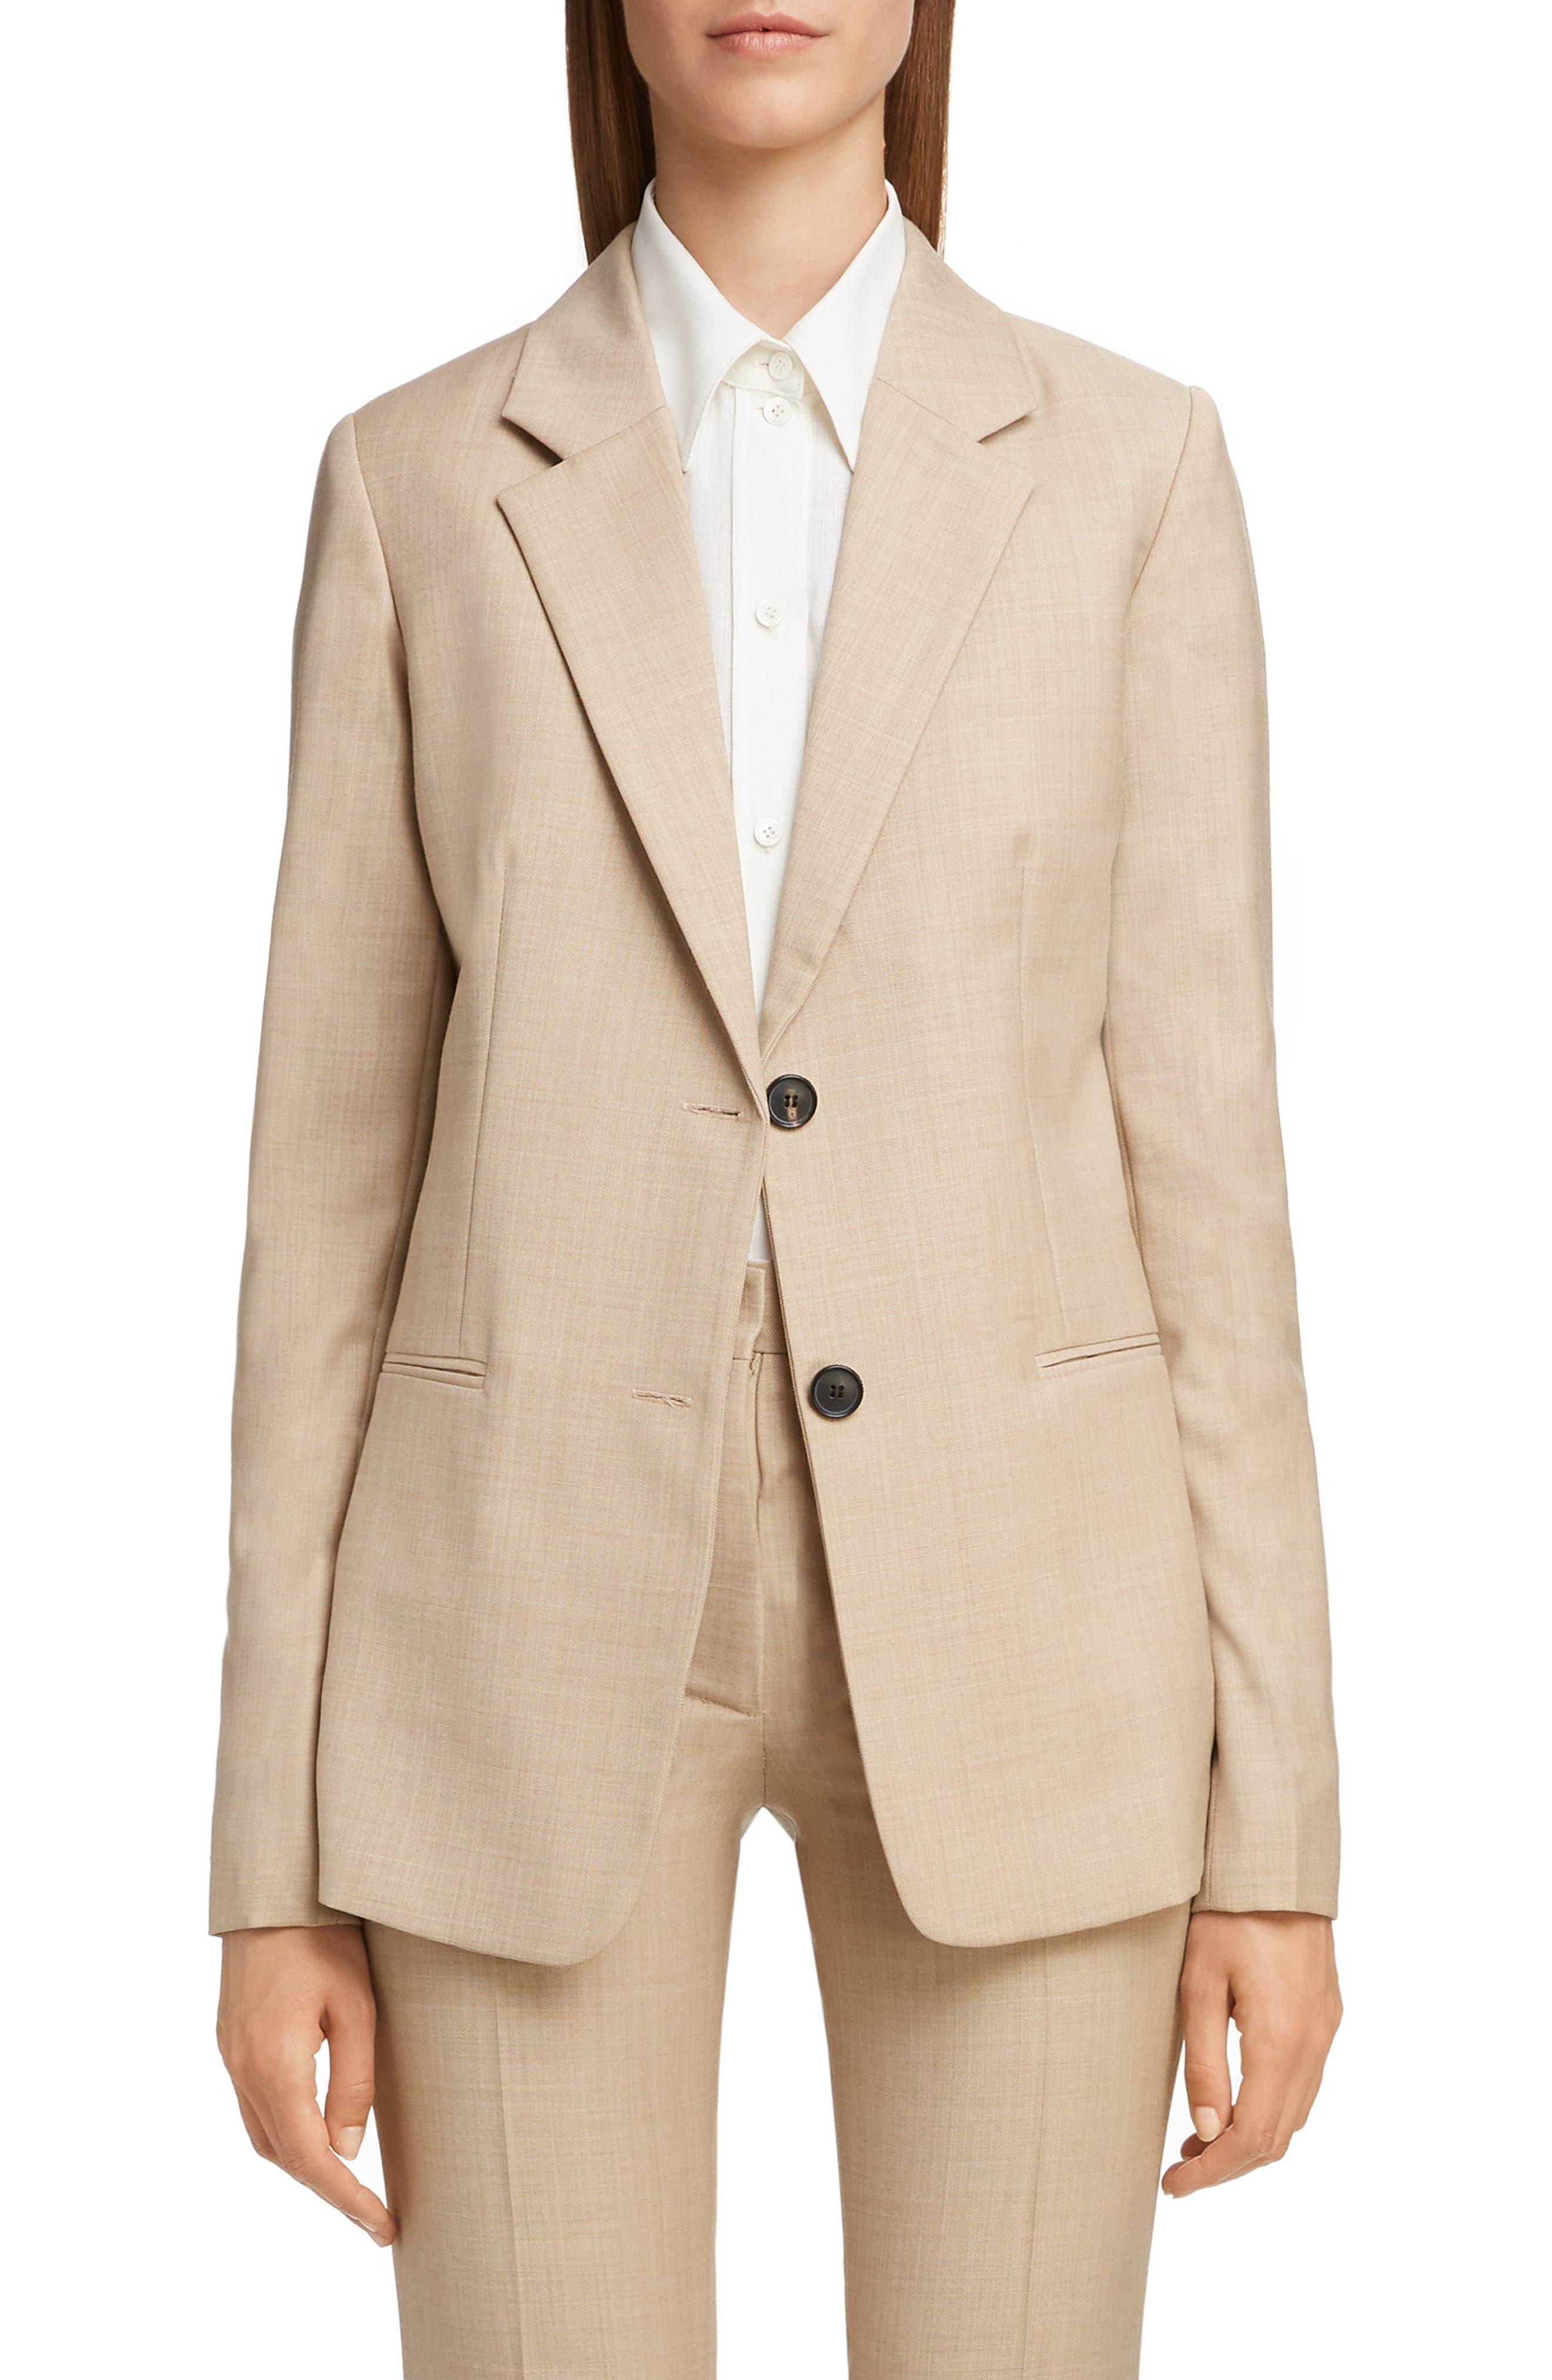 VICTORIA BECKHAM Wool Jacket, Main, color, LIGHT BEIGE-WHITE